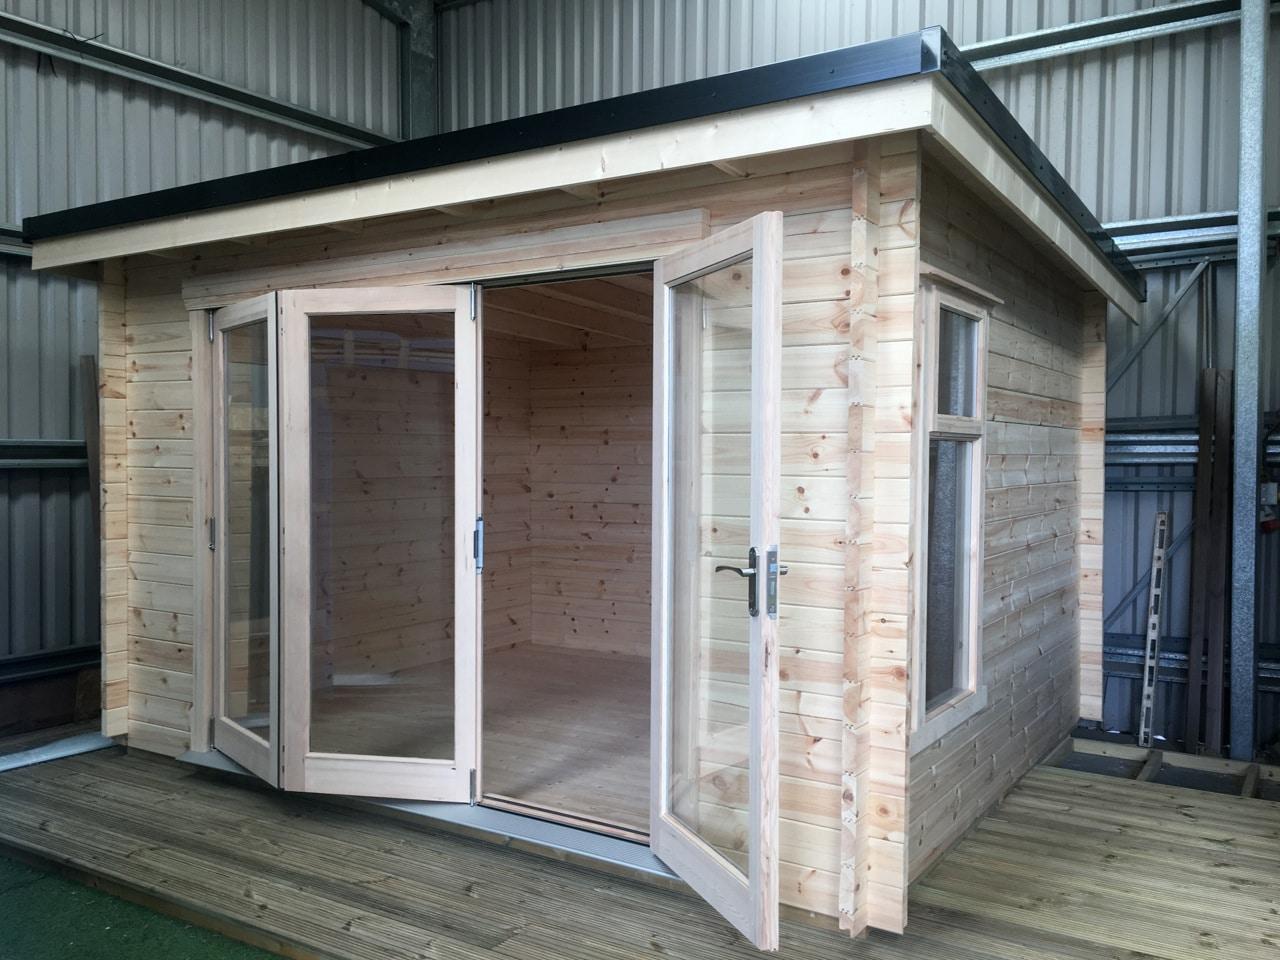 ex-display-pent-log-cabin-tunstall-garden-buildings